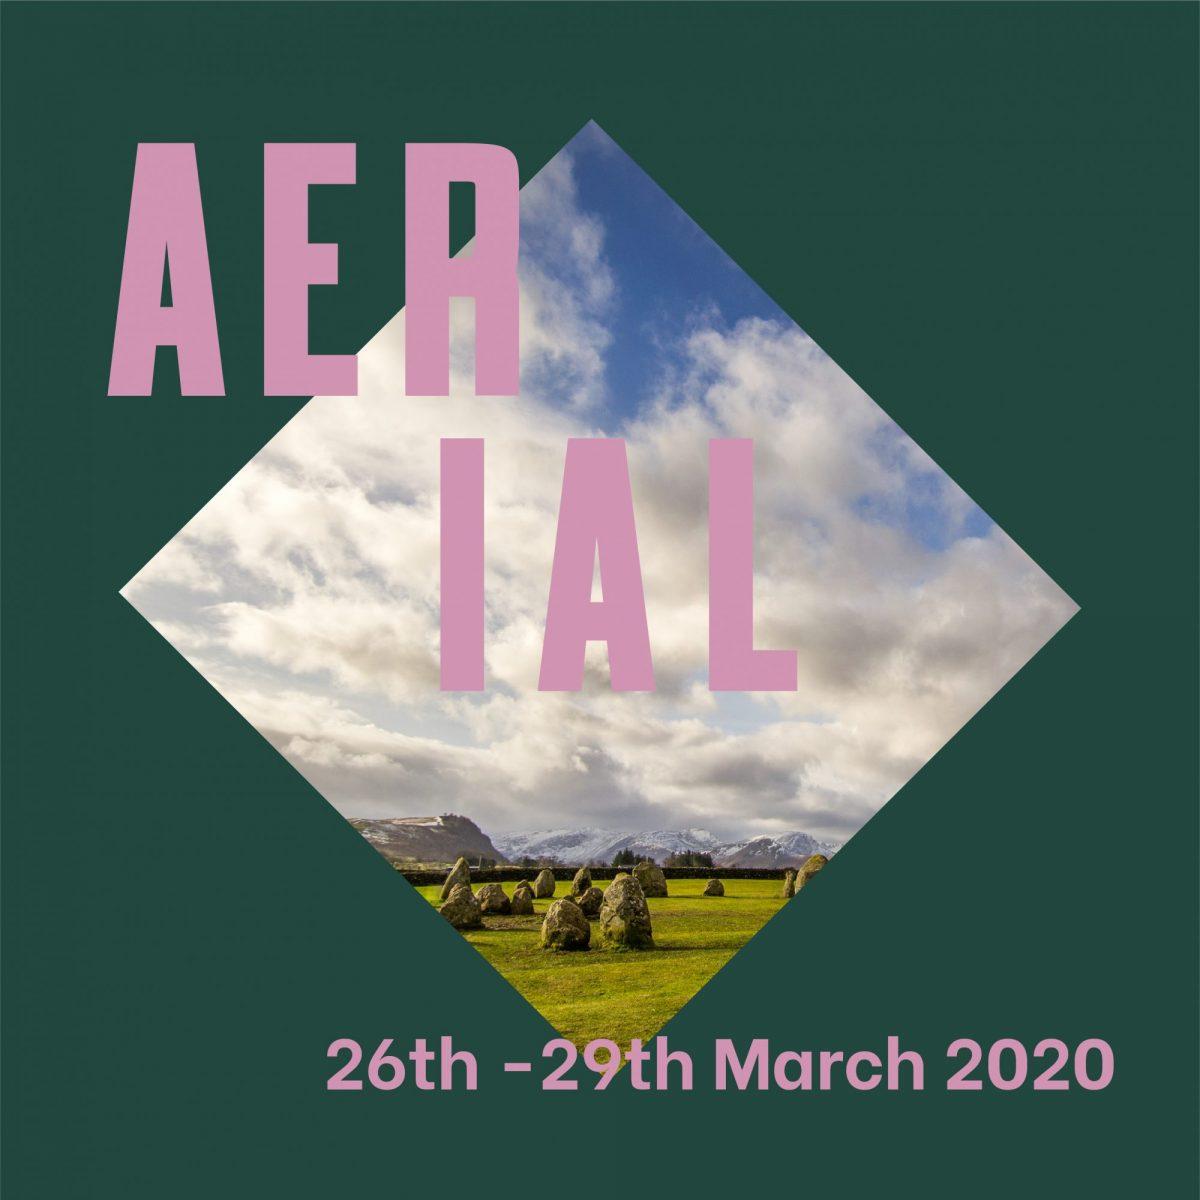 aerial festival 2020